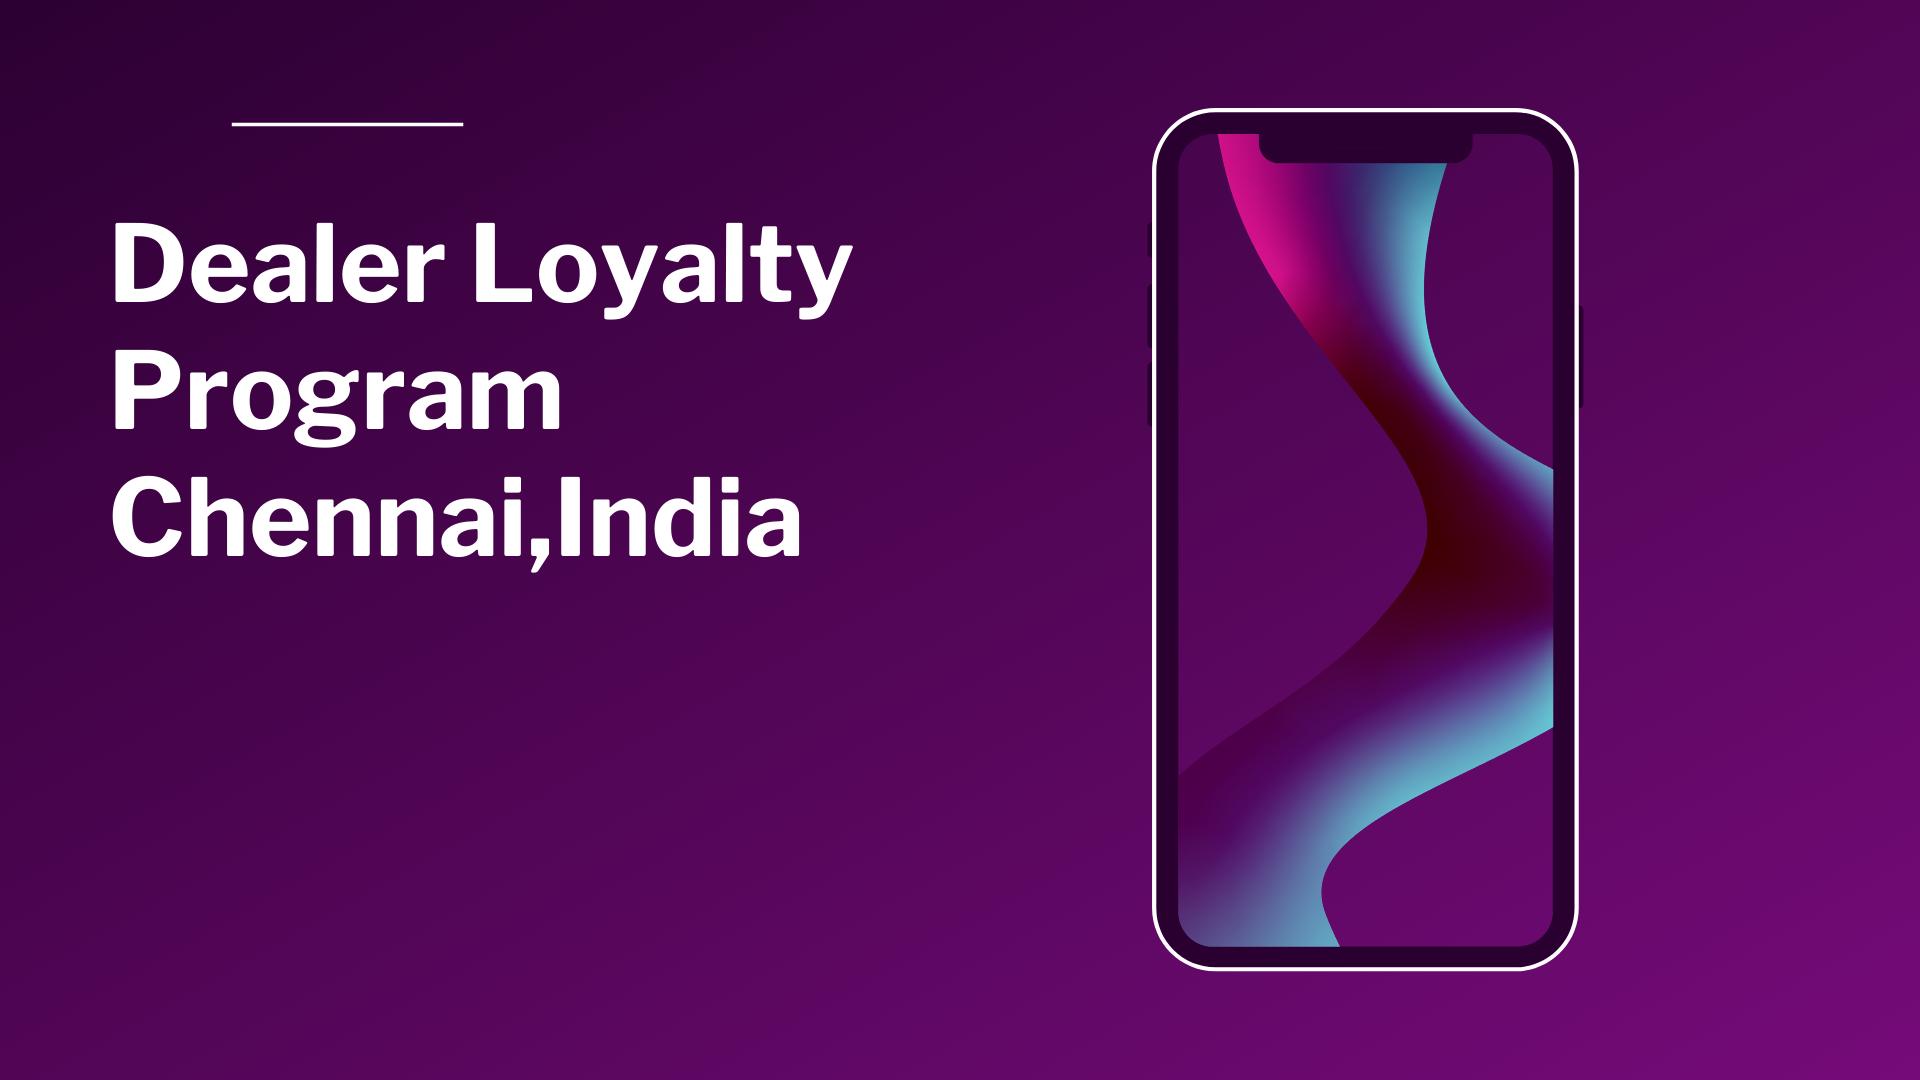 Dealer Loyalty Program Chennai,India